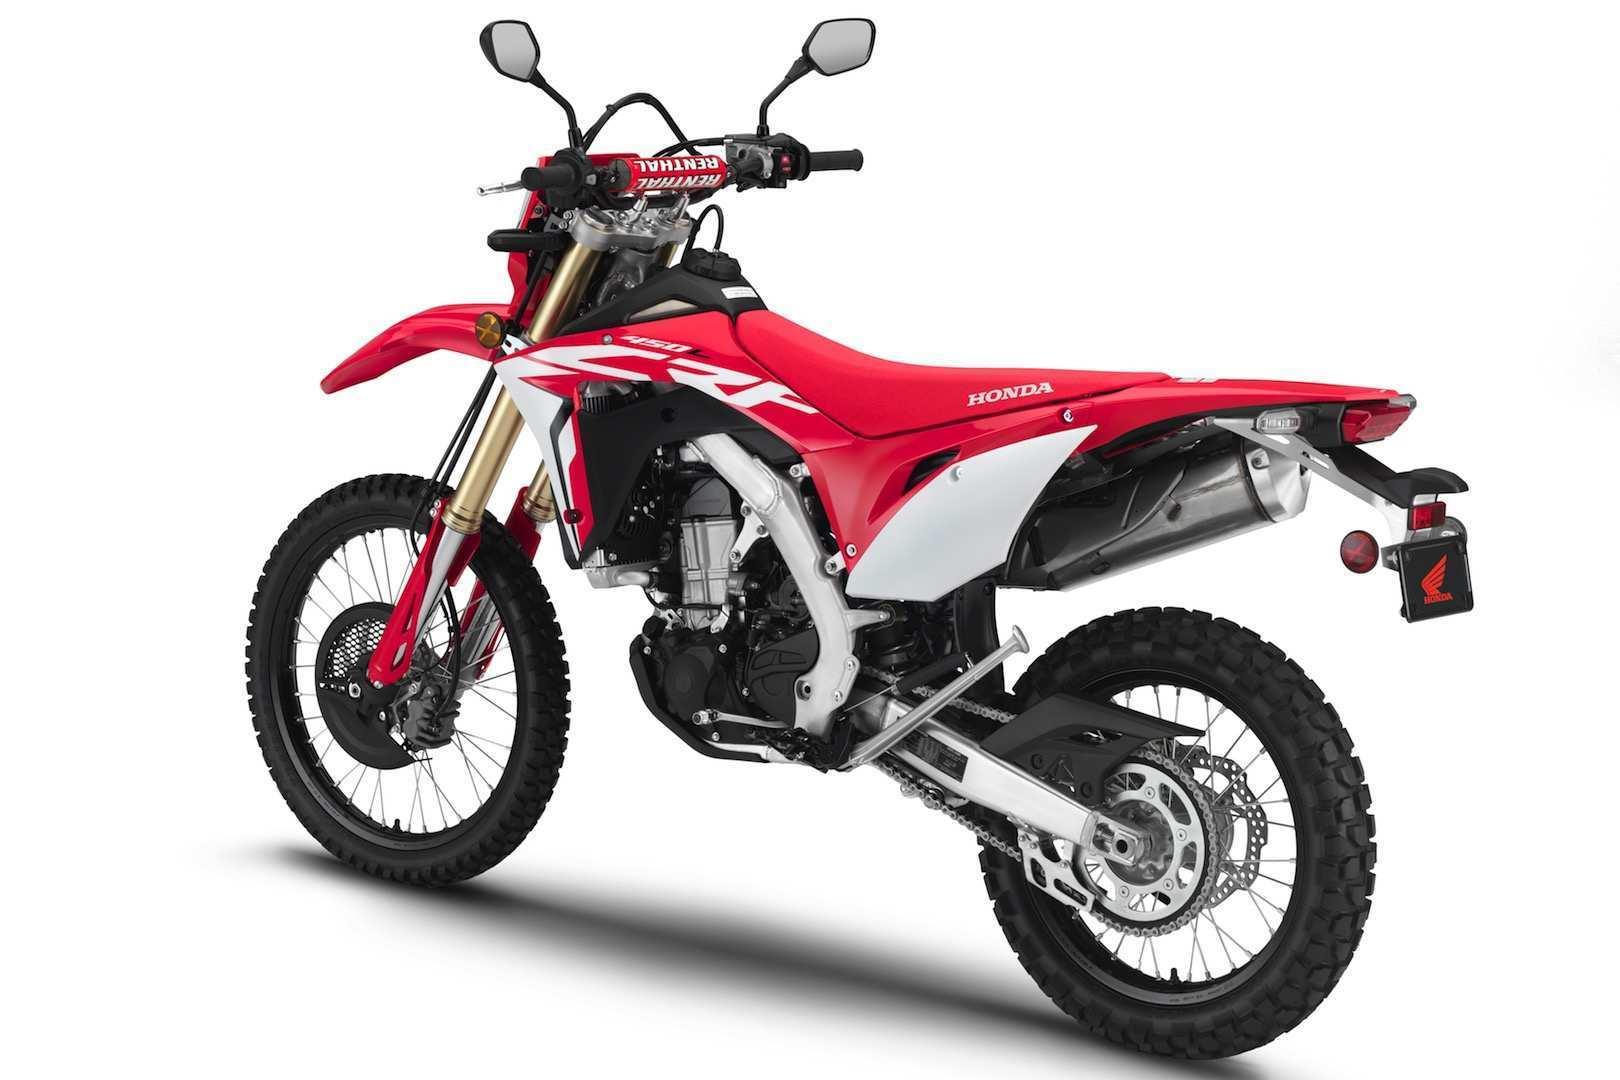 12 Concept of 2019 Honda 450 Dual Sport Price and Review for 2019 Honda 450 Dual Sport